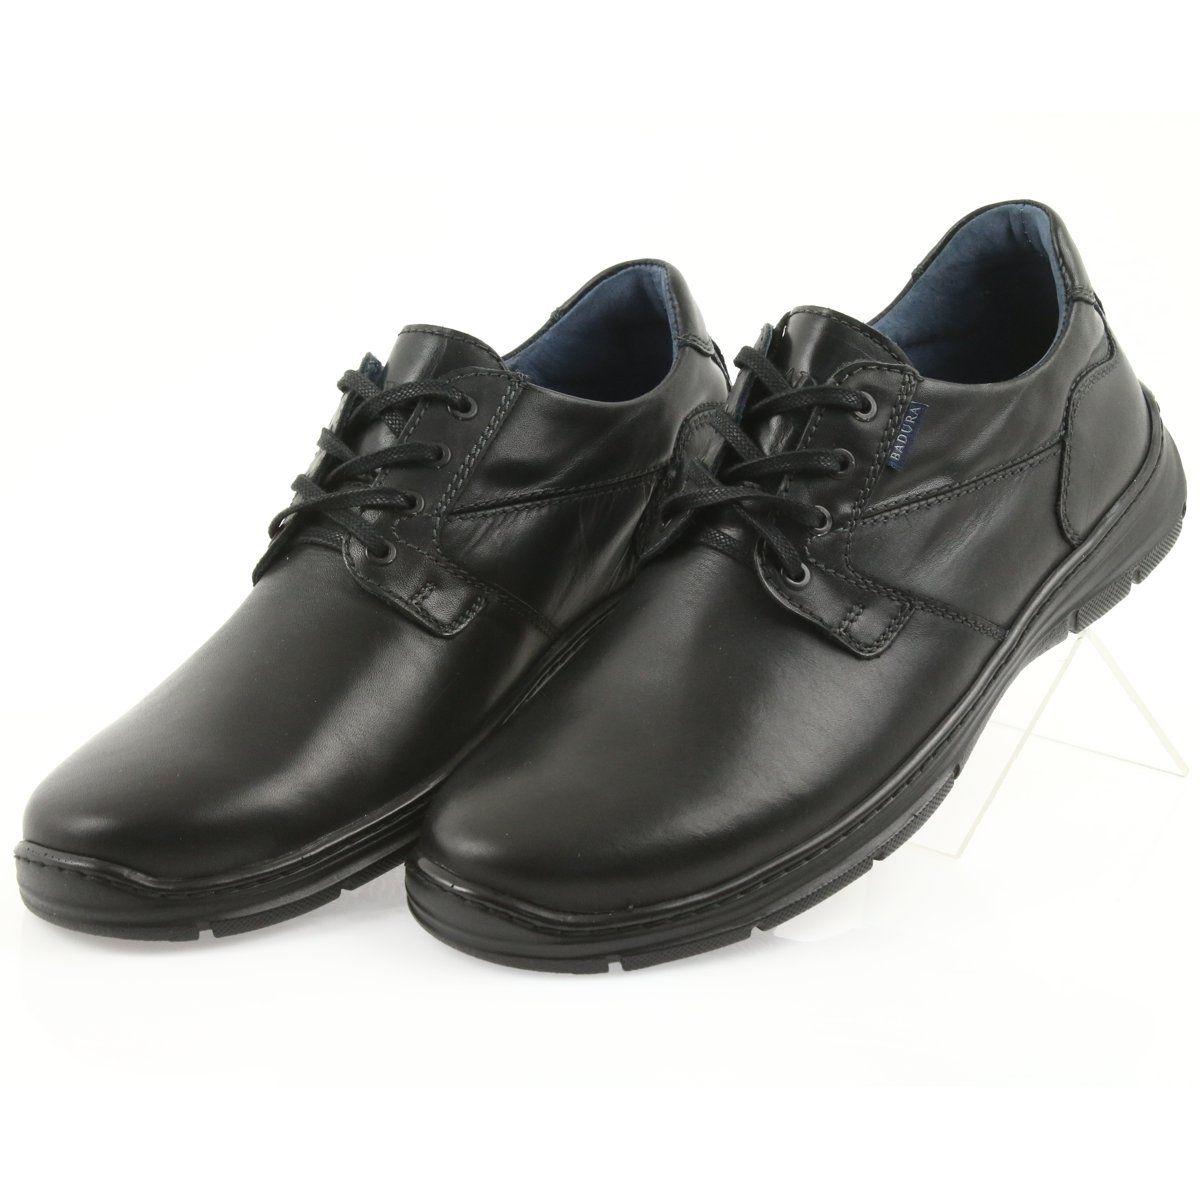 Badura Polbuty Meskie Komfort 3509 Czarne Dress Shoes Men Low Boots Boots Men